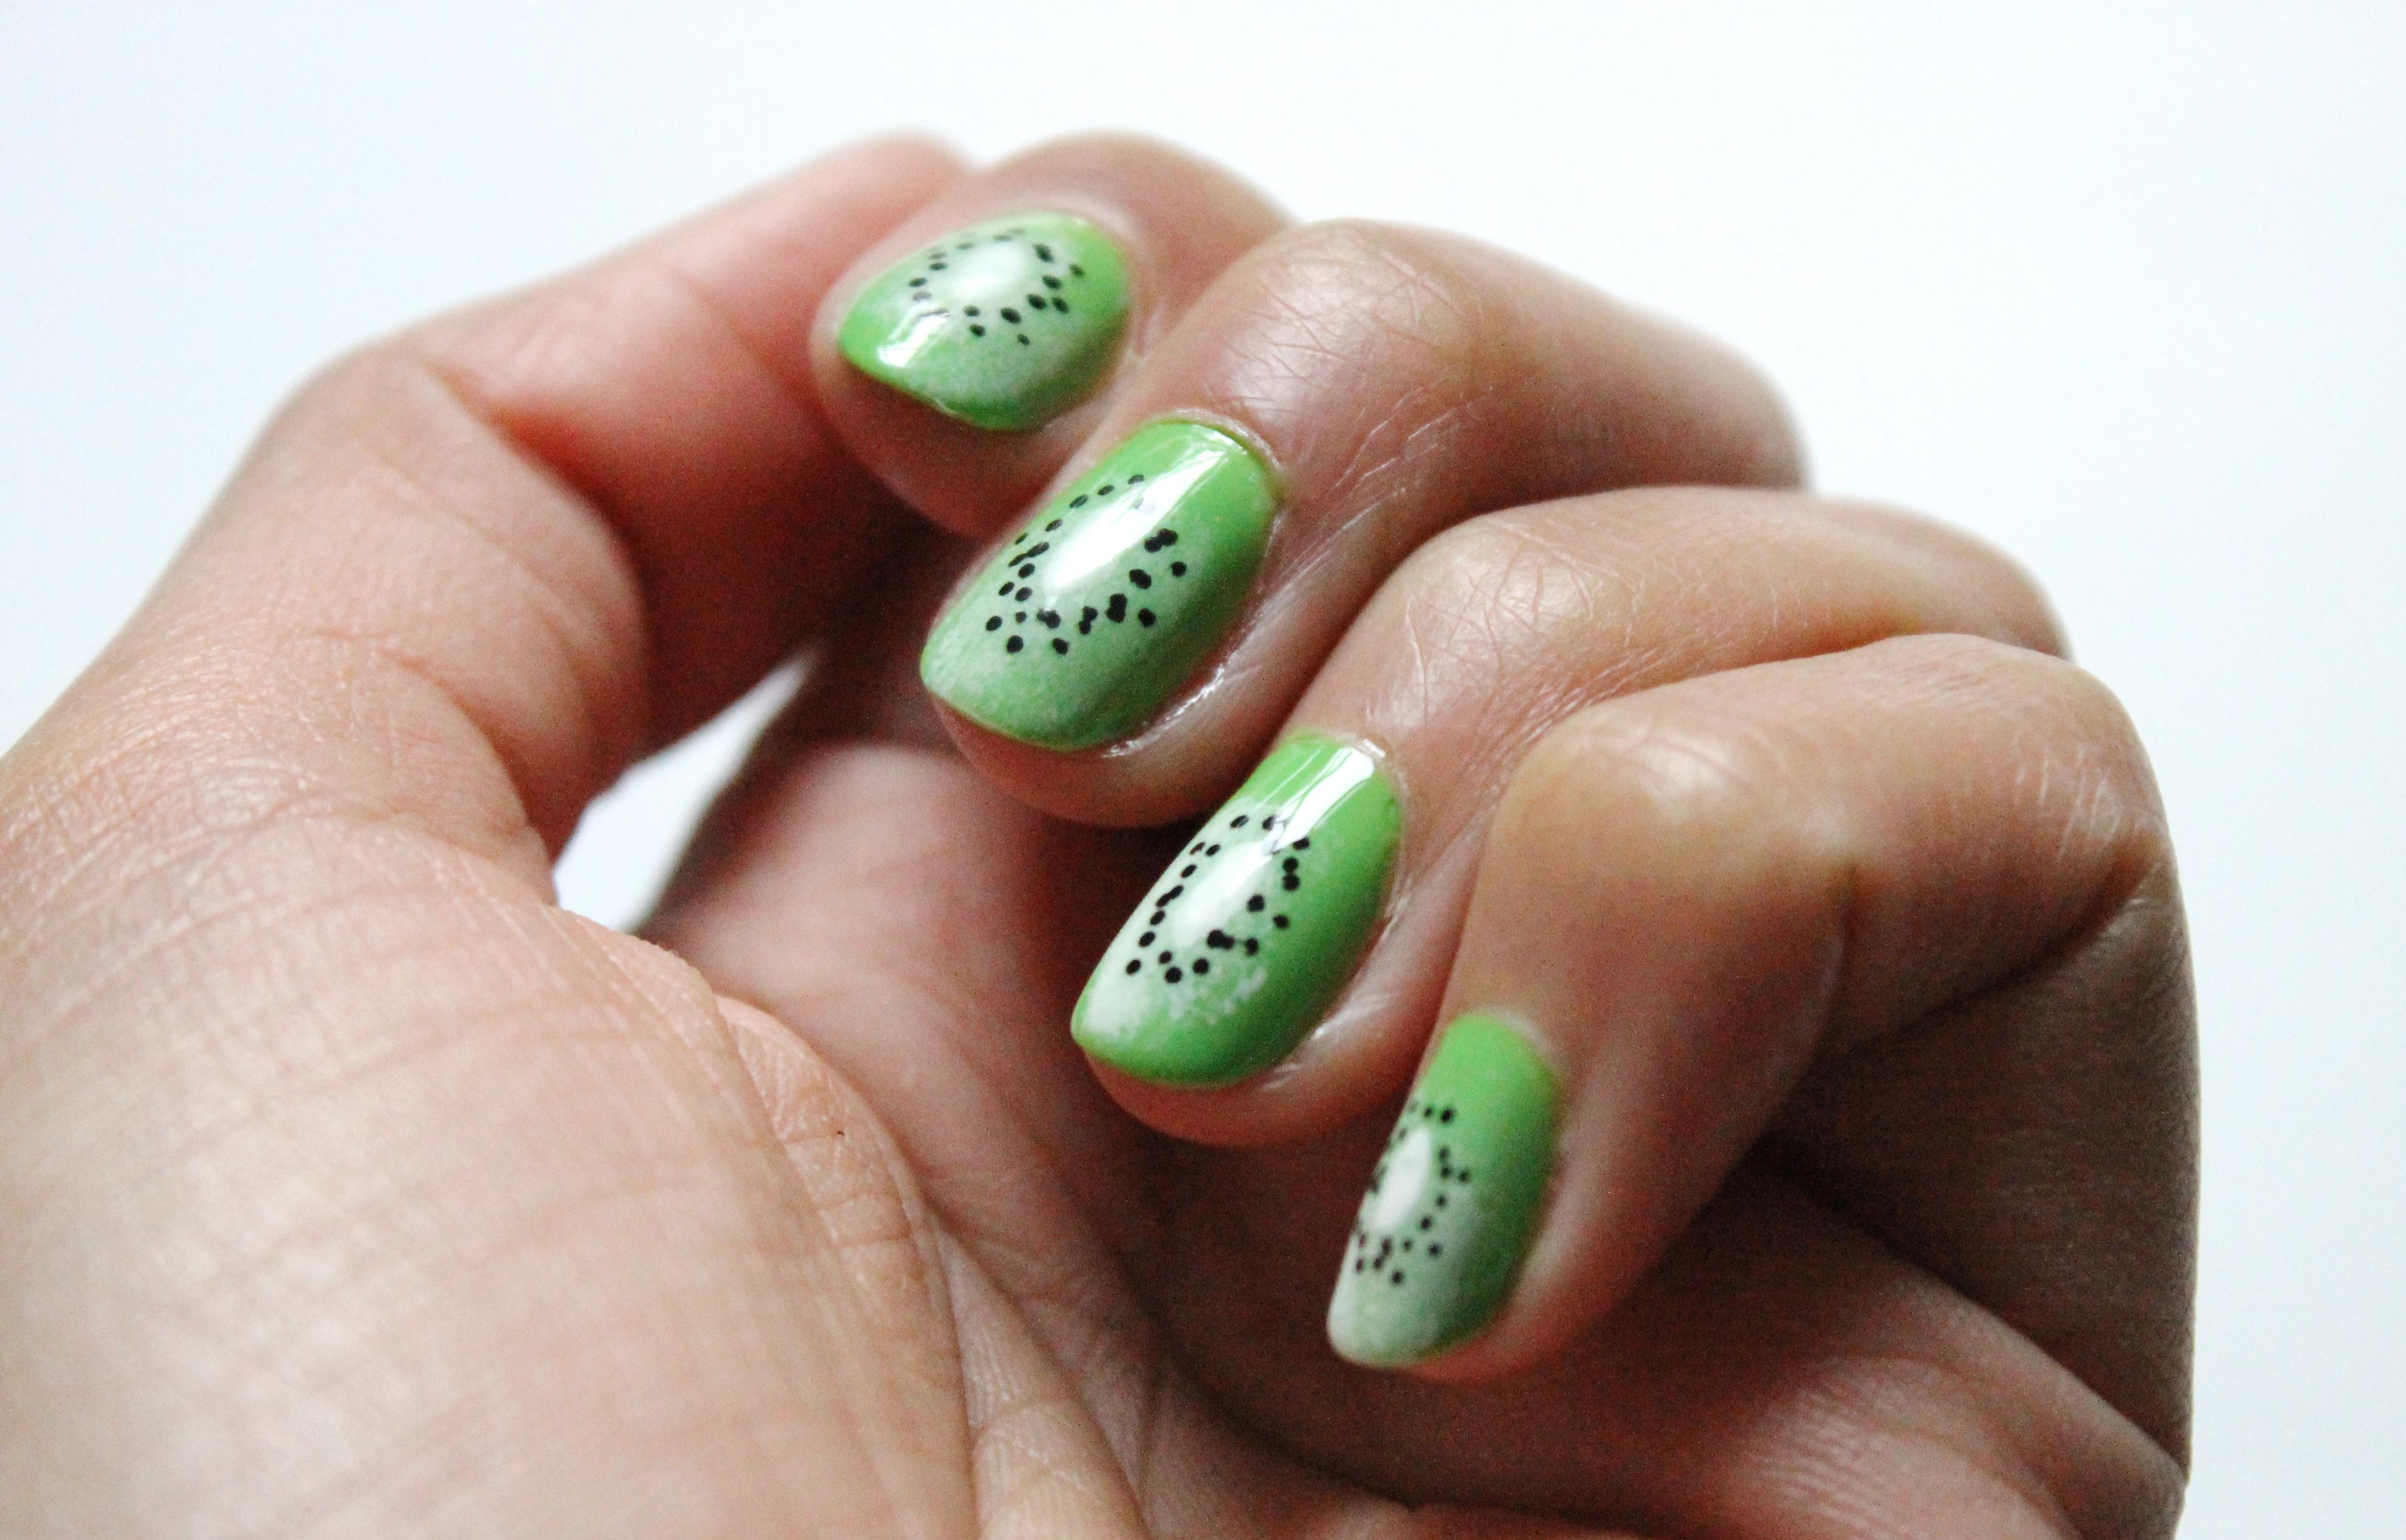 nail-art-kiwi-4